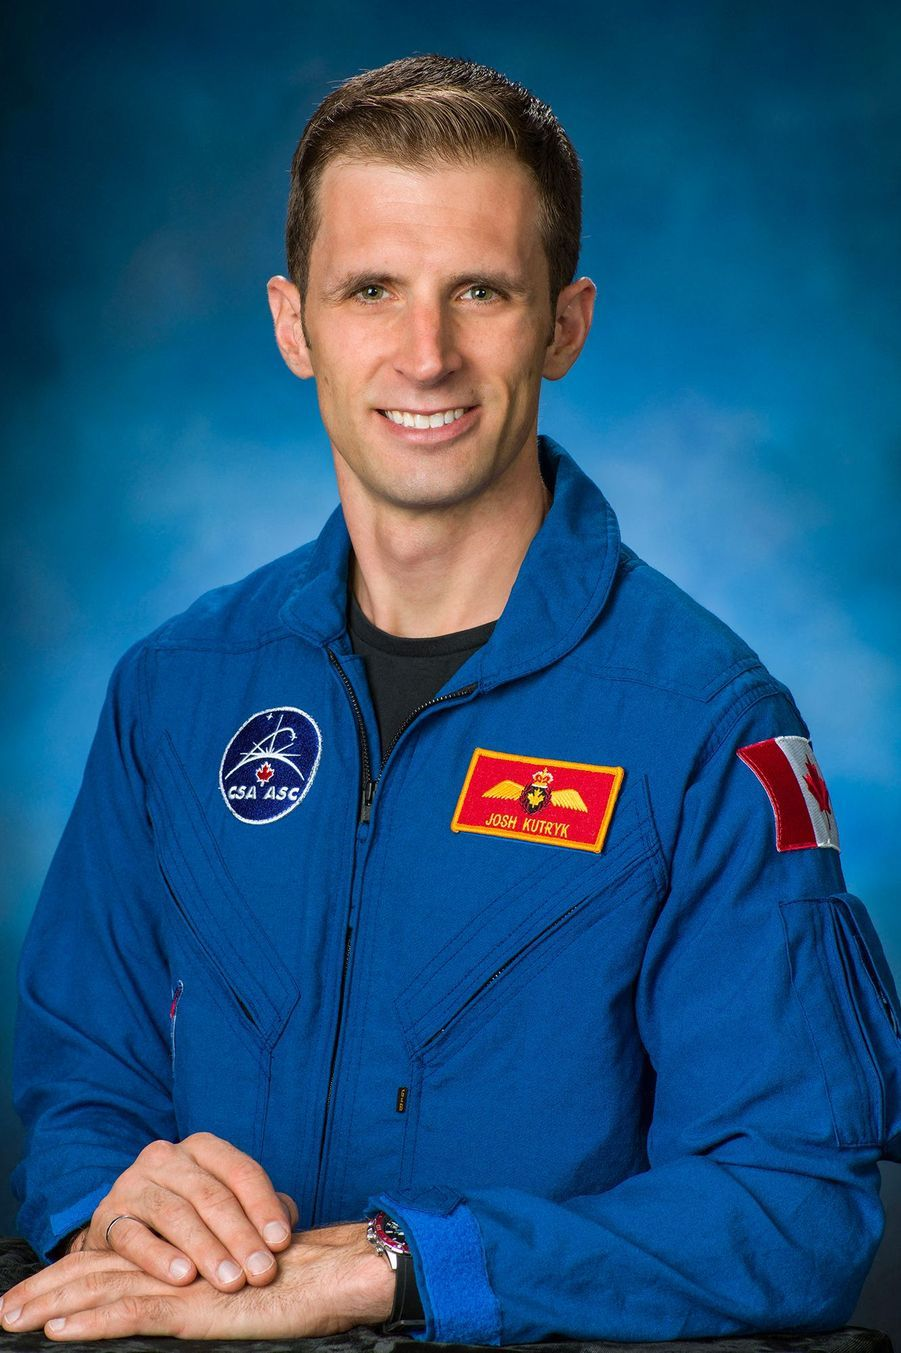 Josh Kutryk.